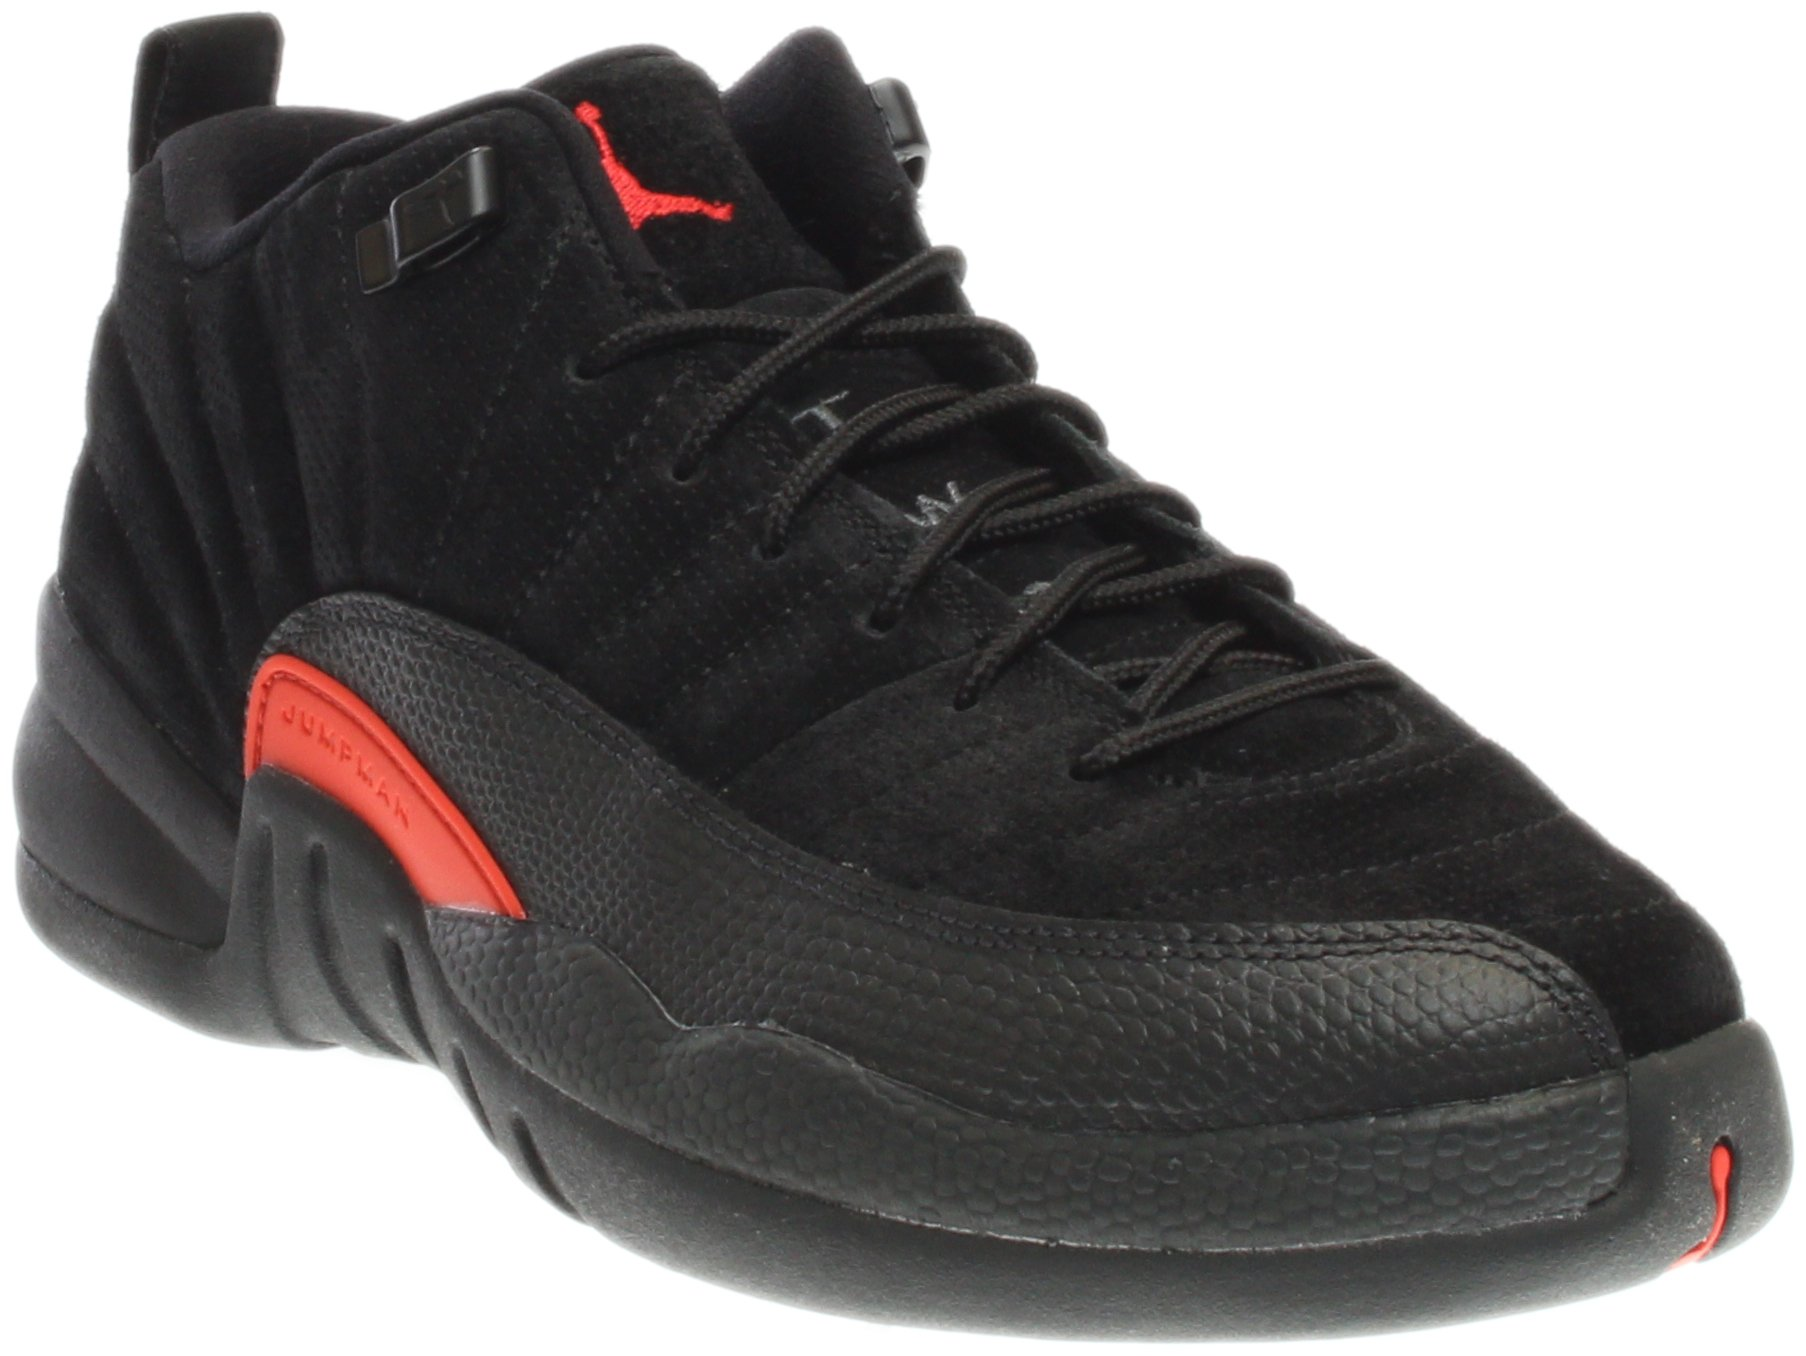 lowest price be92e 6d42c Jordan Retro 12